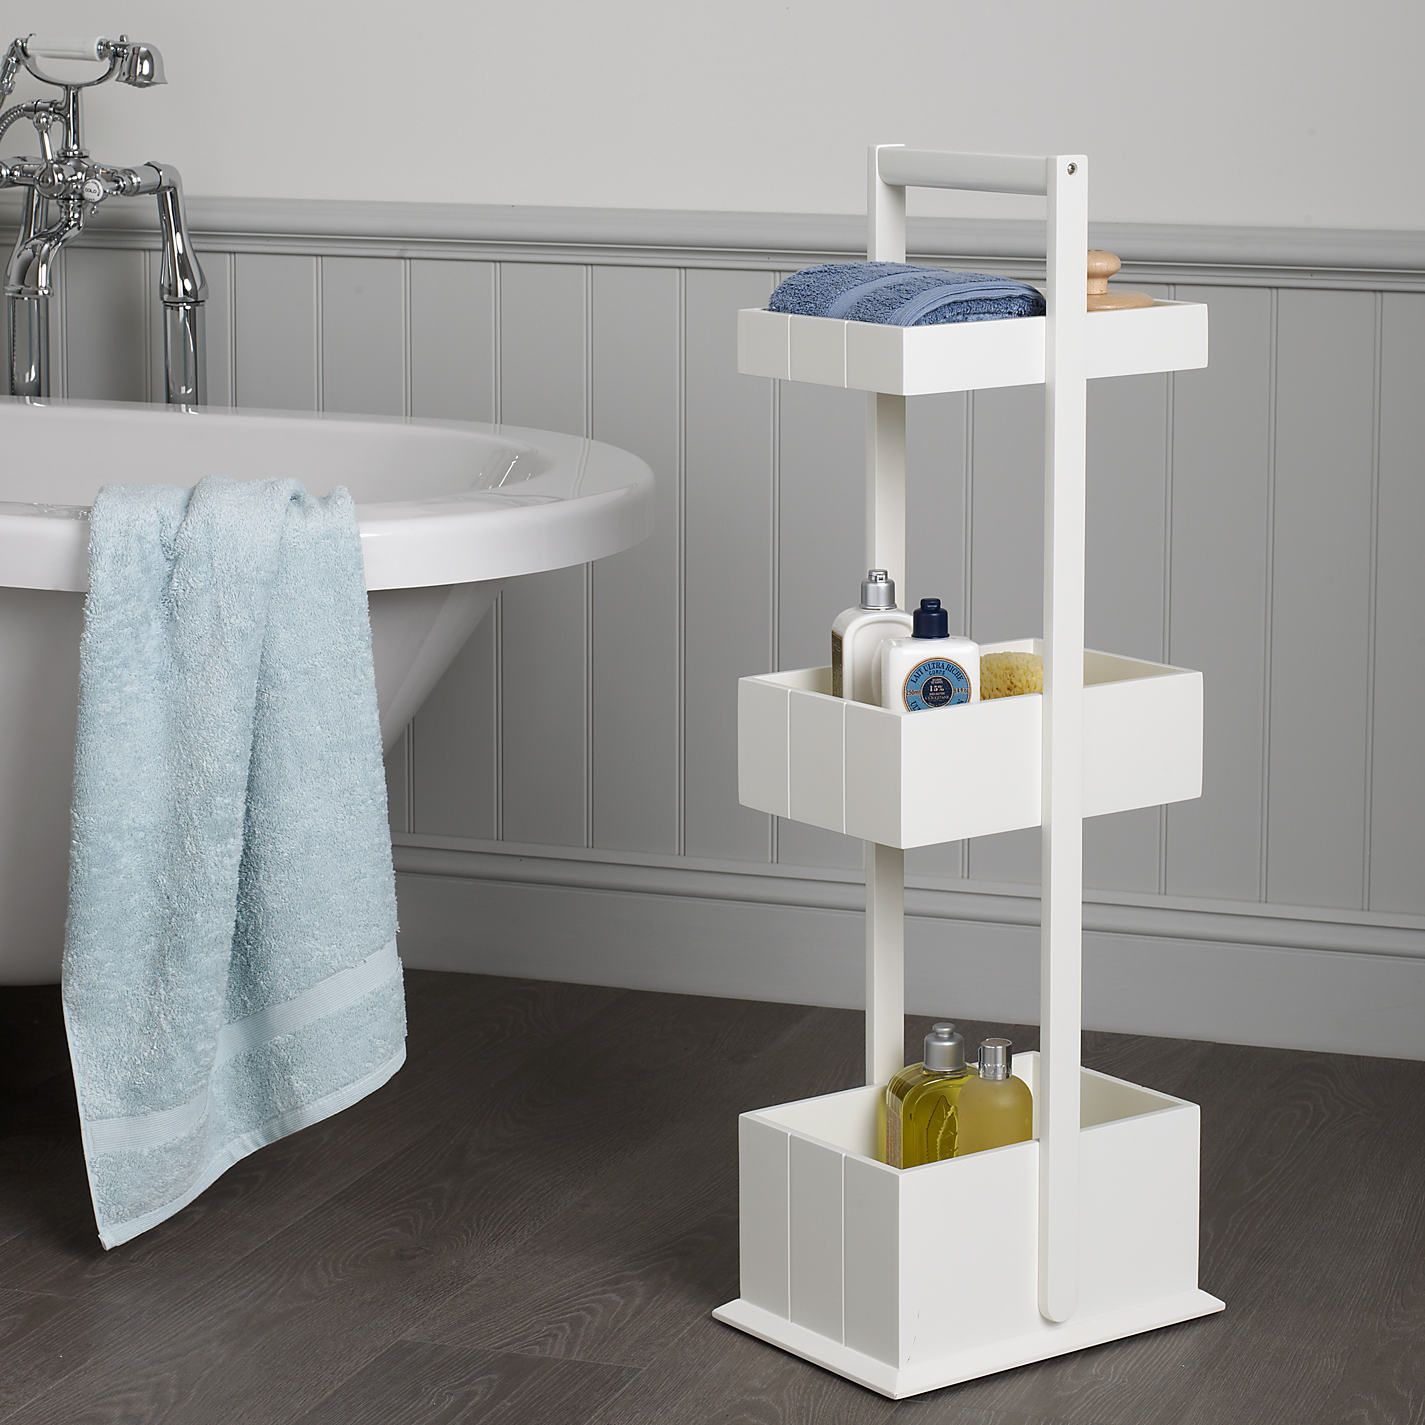 Bathroom Floor Caddy - talentneeds.com -